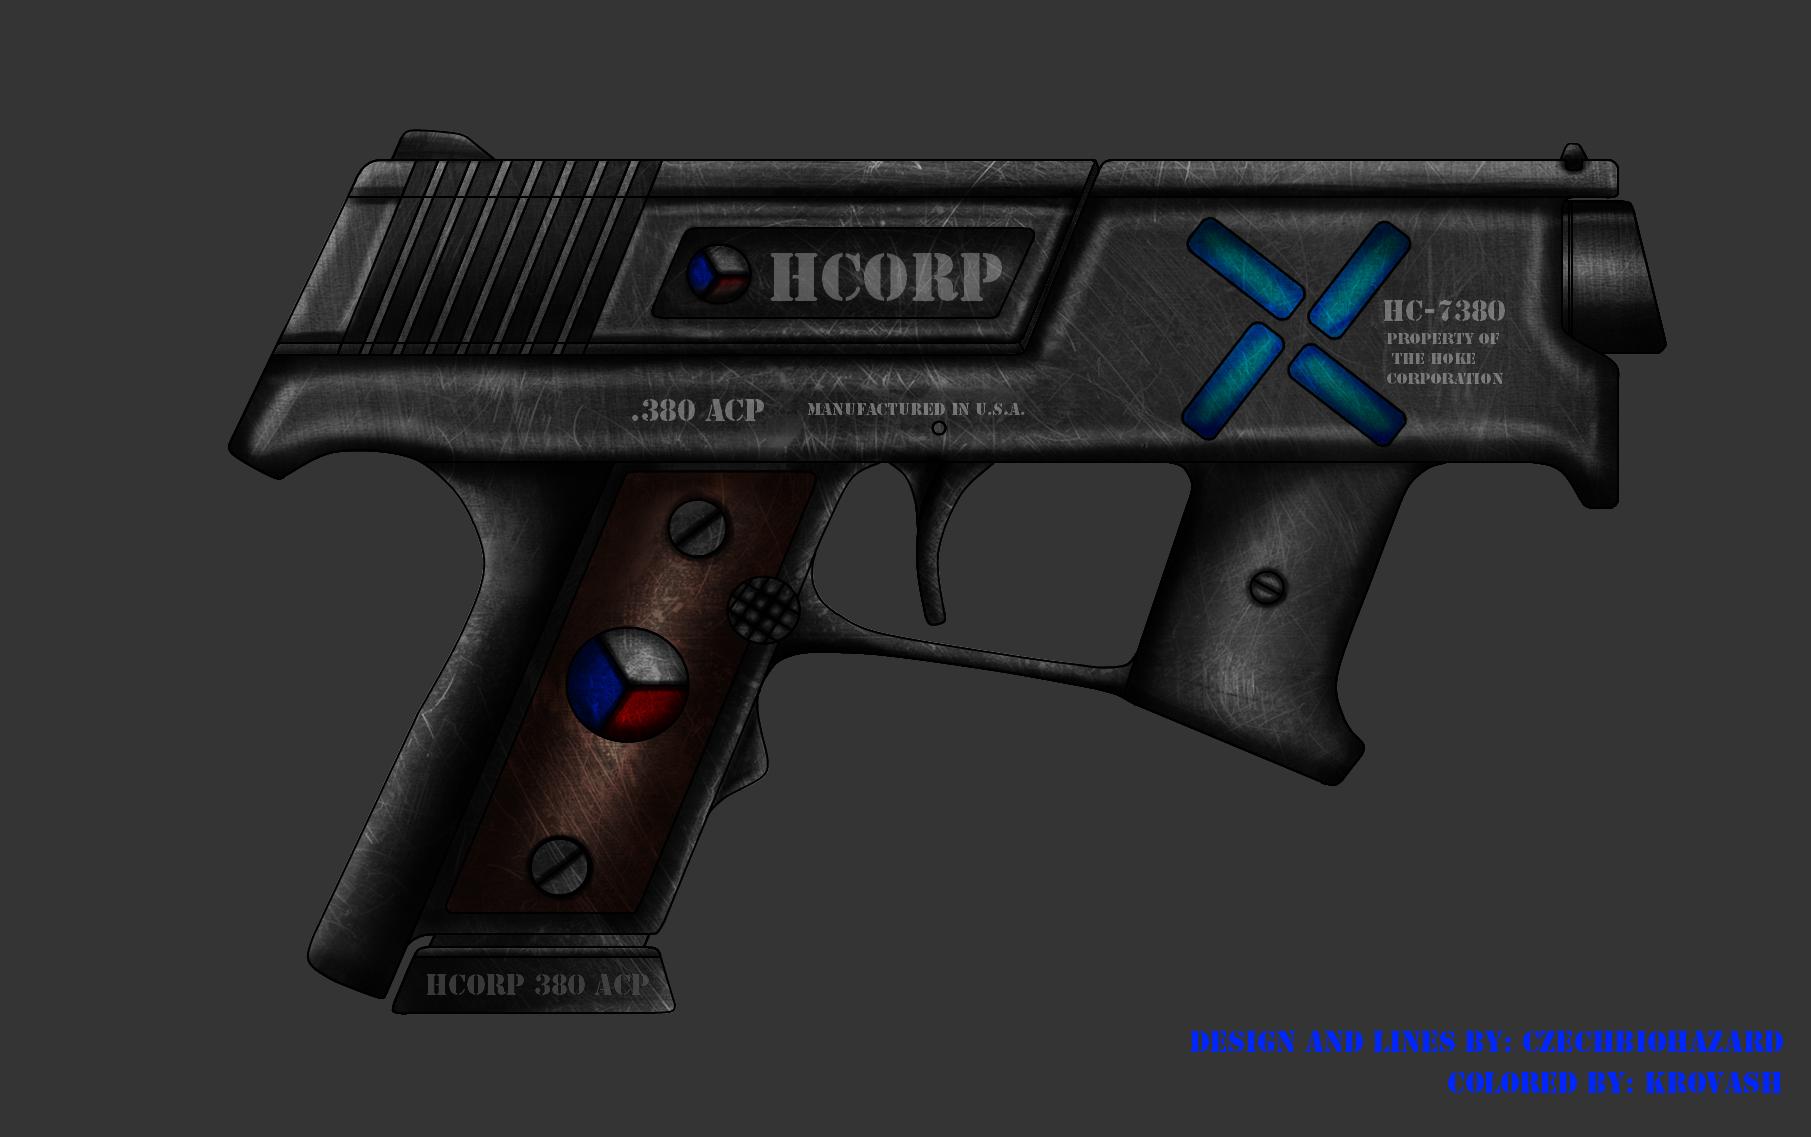 Collab: Fictional Firearm: HC-7380 Compact Pistol by CzechBiohazard